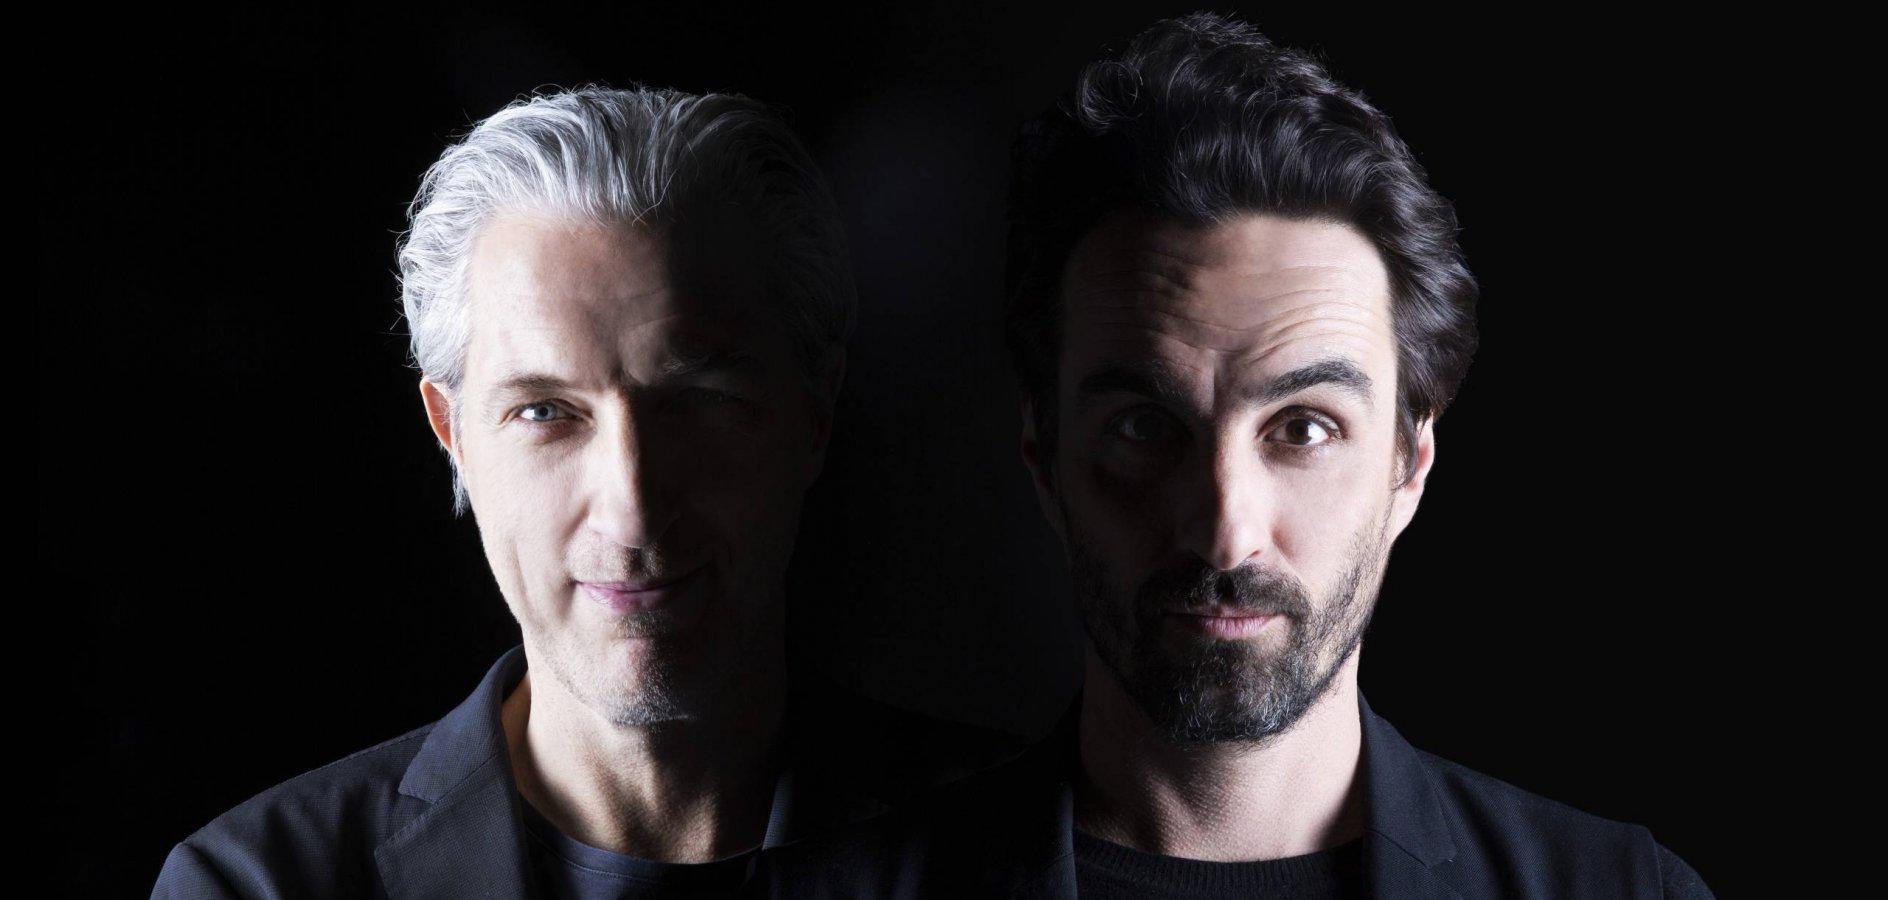 Marcel Wanders, Gabriele Chiave, interview